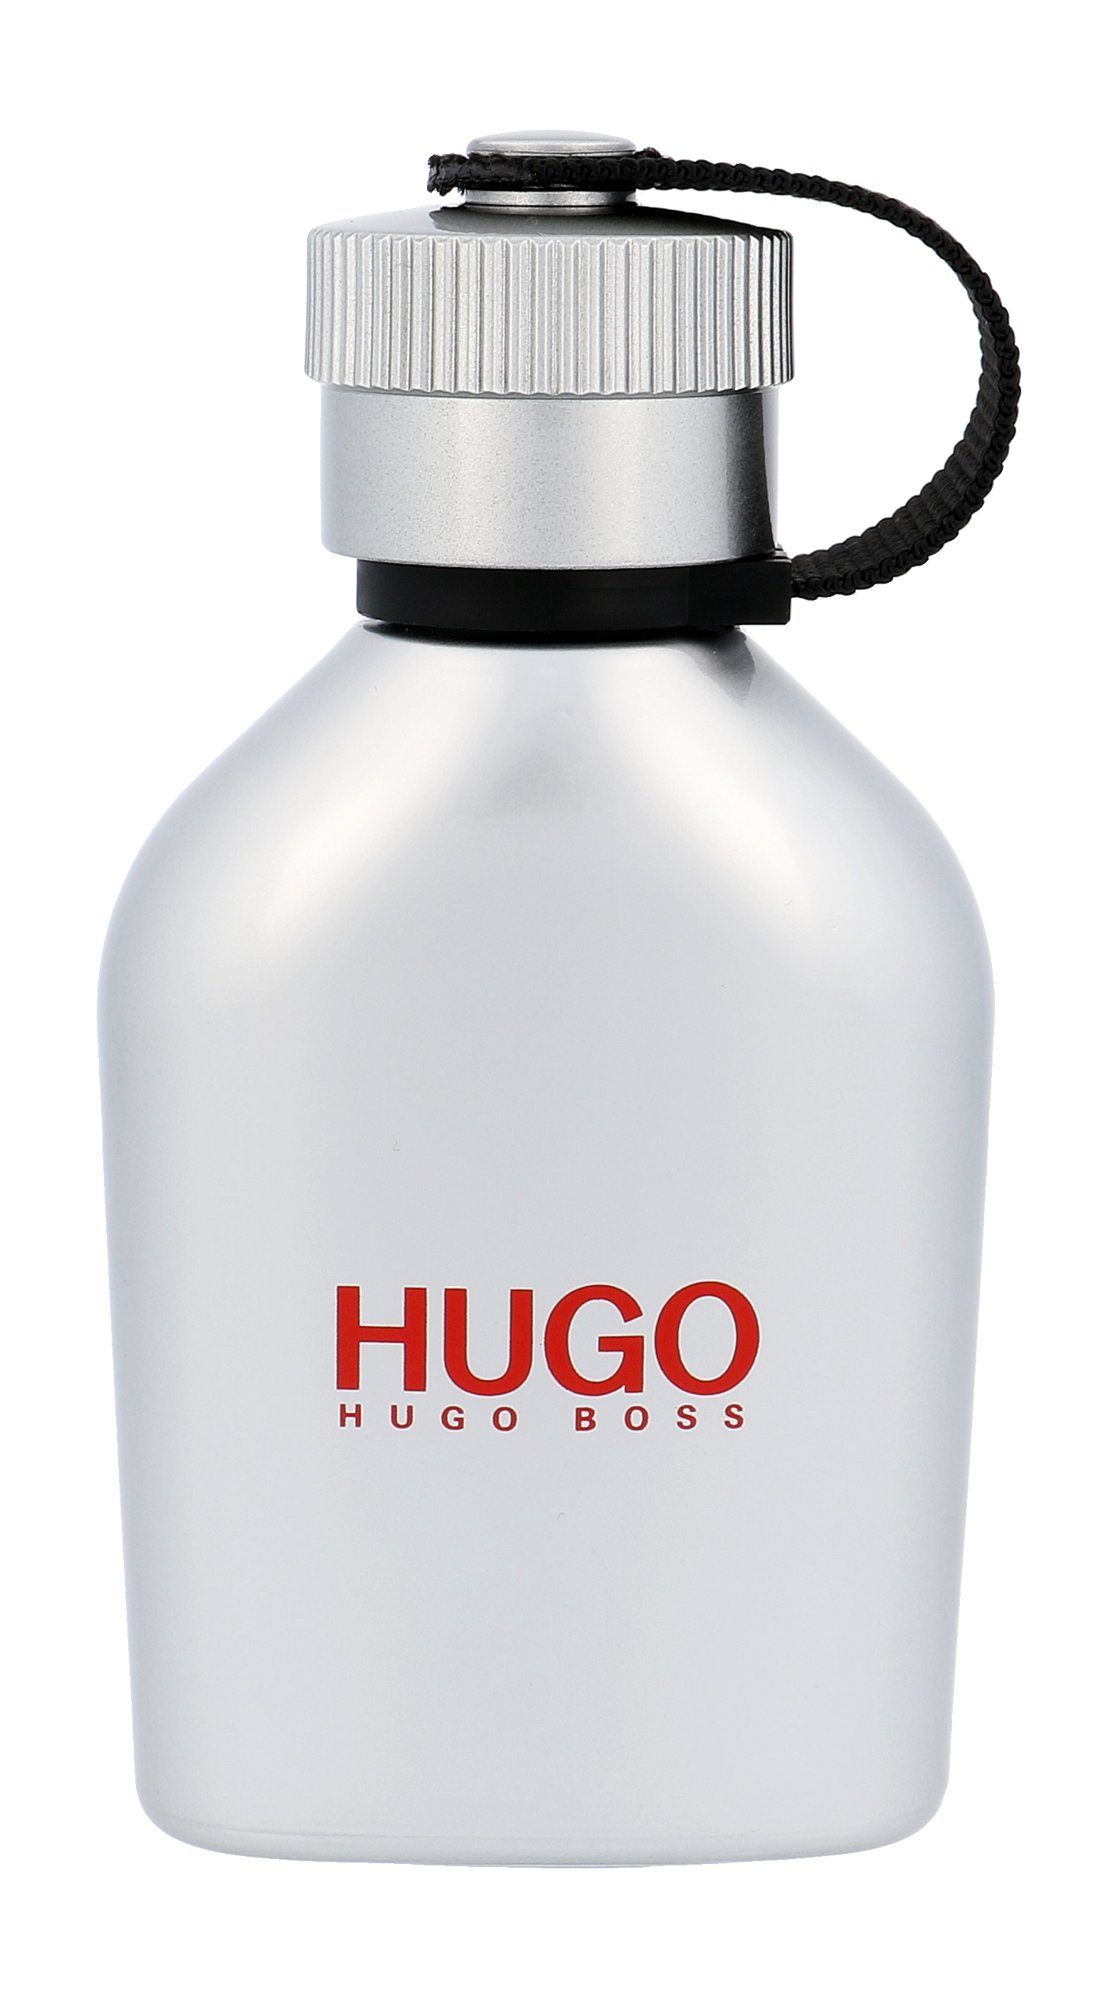 HUGO BOSS Hugo Iced, Toaletná voda 75ml